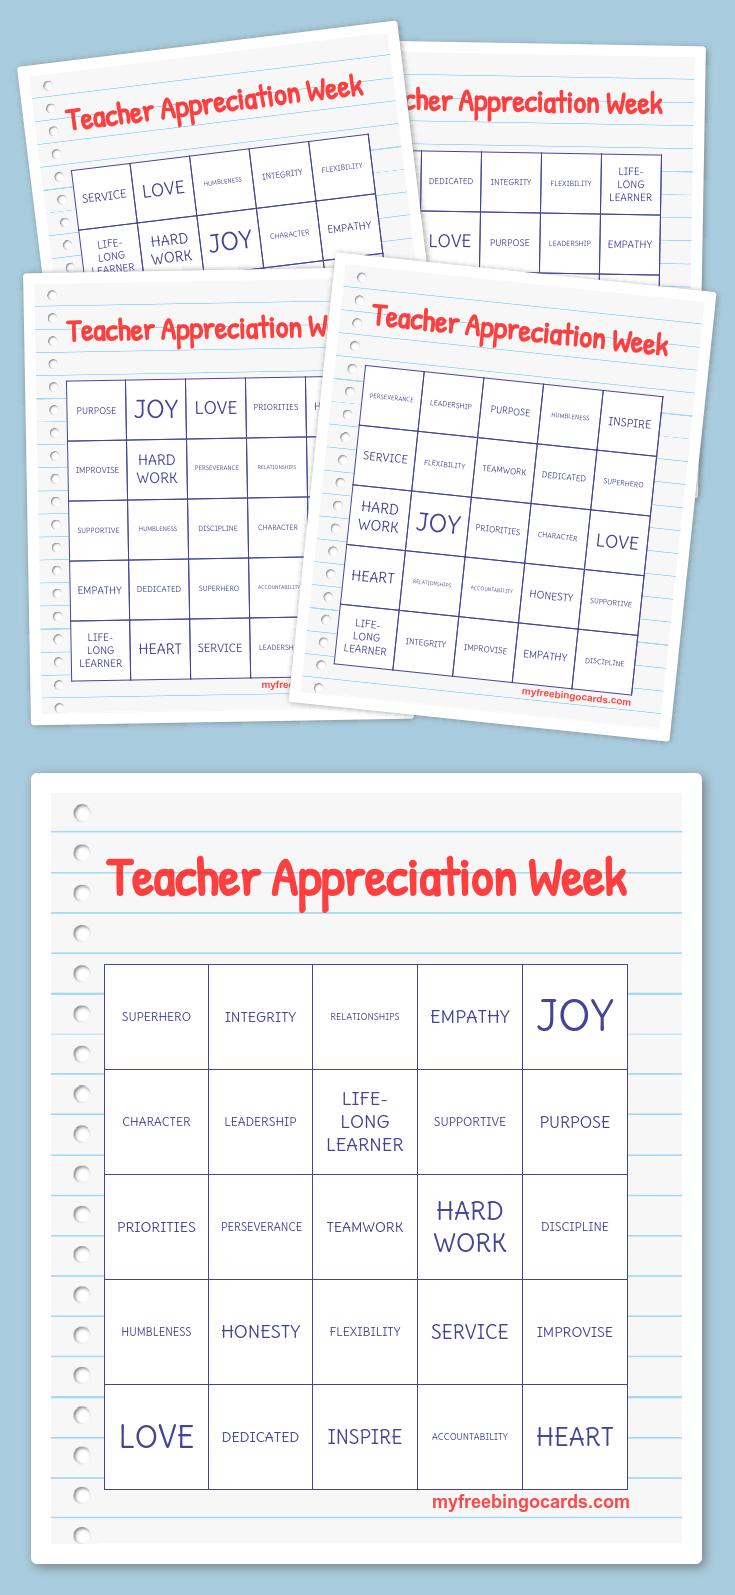 Teacher Appreciation Week Bingo | Teacher | Free Bingo Cards, Word - Free Printable Bingo Cards For Teachers